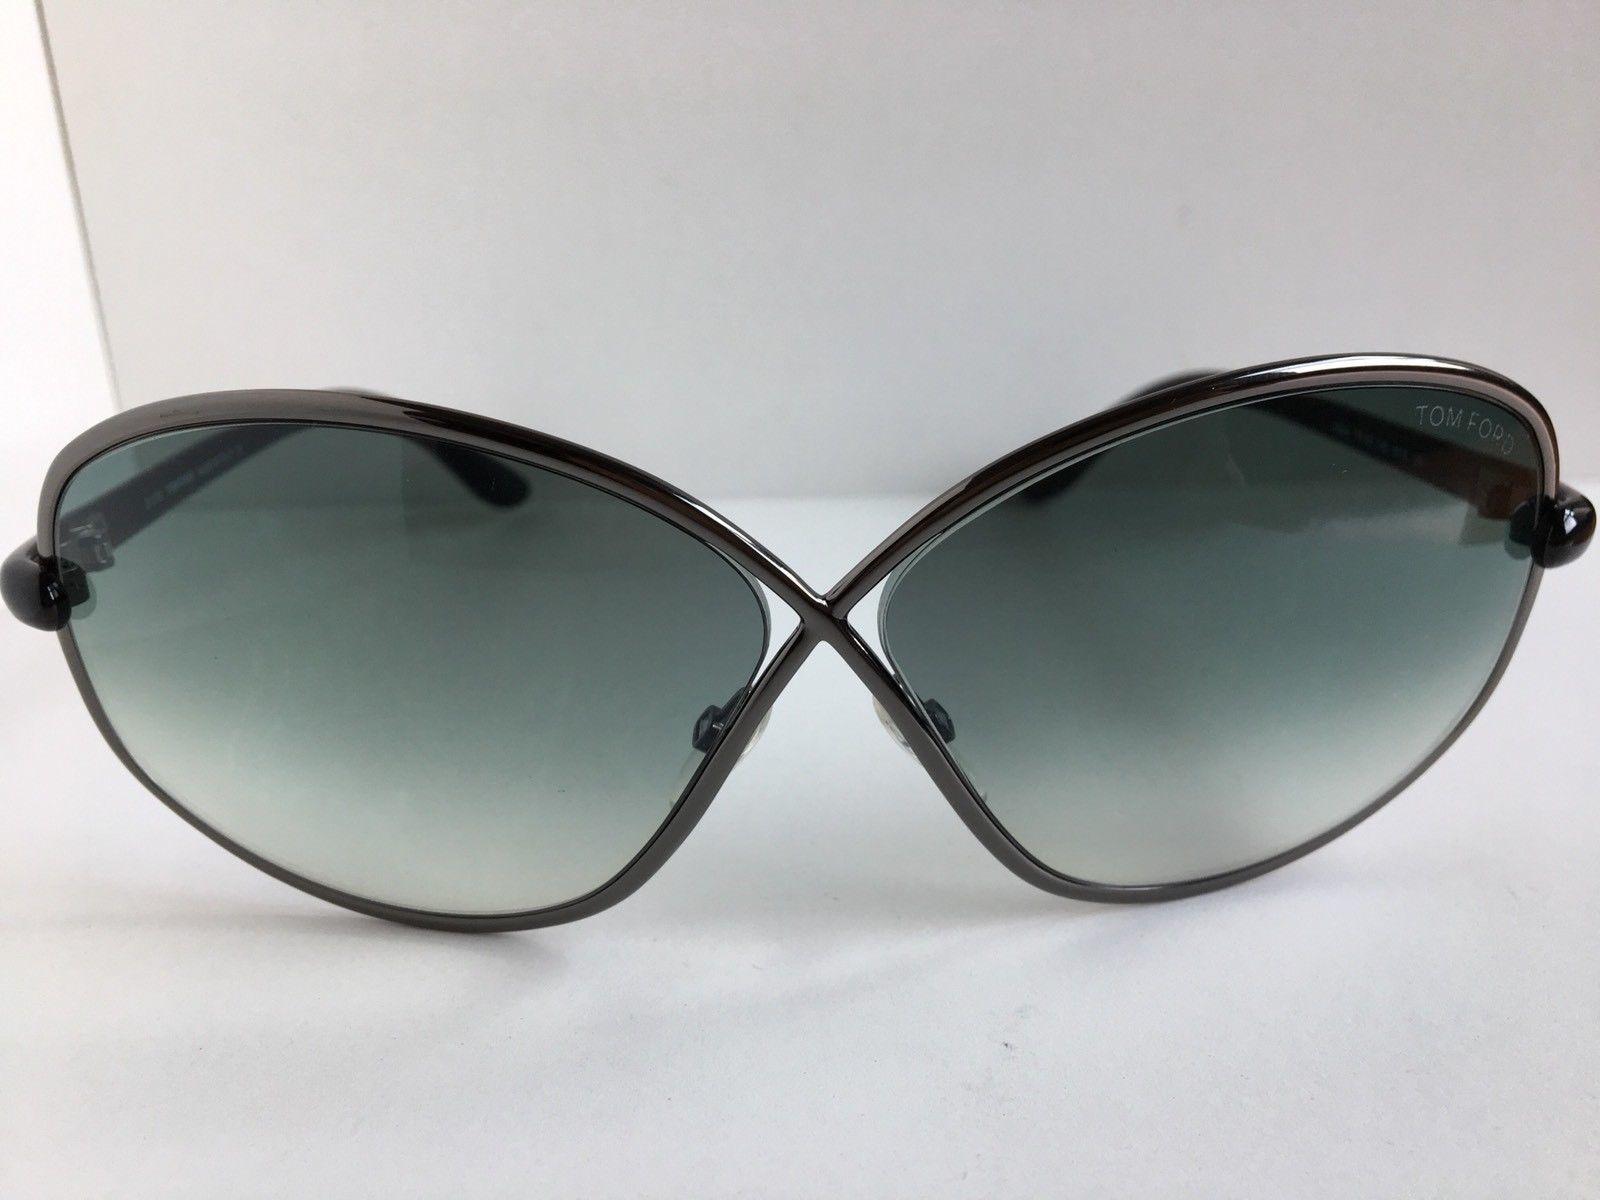 bceca744ed S l1600. S l1600. Previous. Tom Ford Brigitte TF 160 08B 65mm Gray  Oversized Women s Sunglasses T1